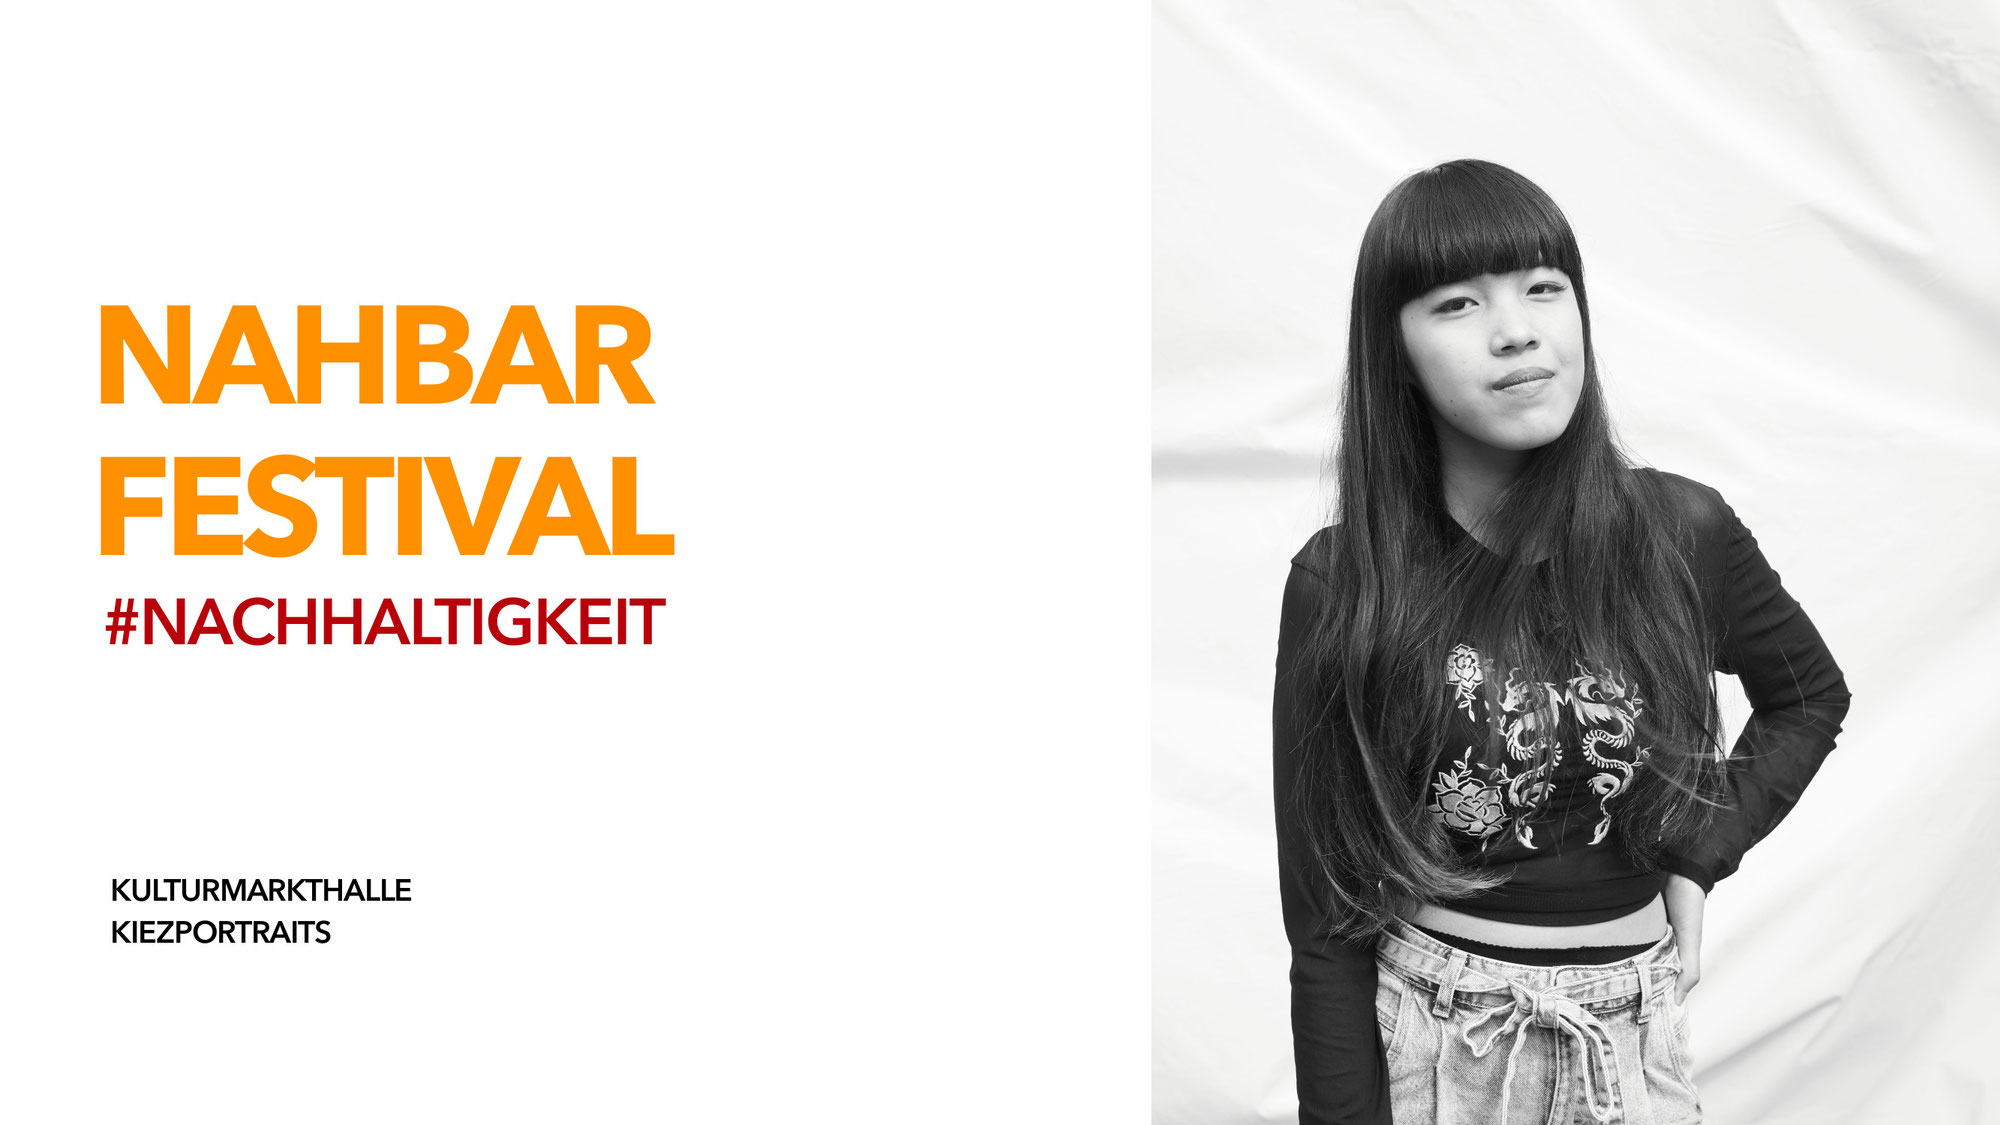 Aufruf: Fotoprojekt im nah_bar_festival